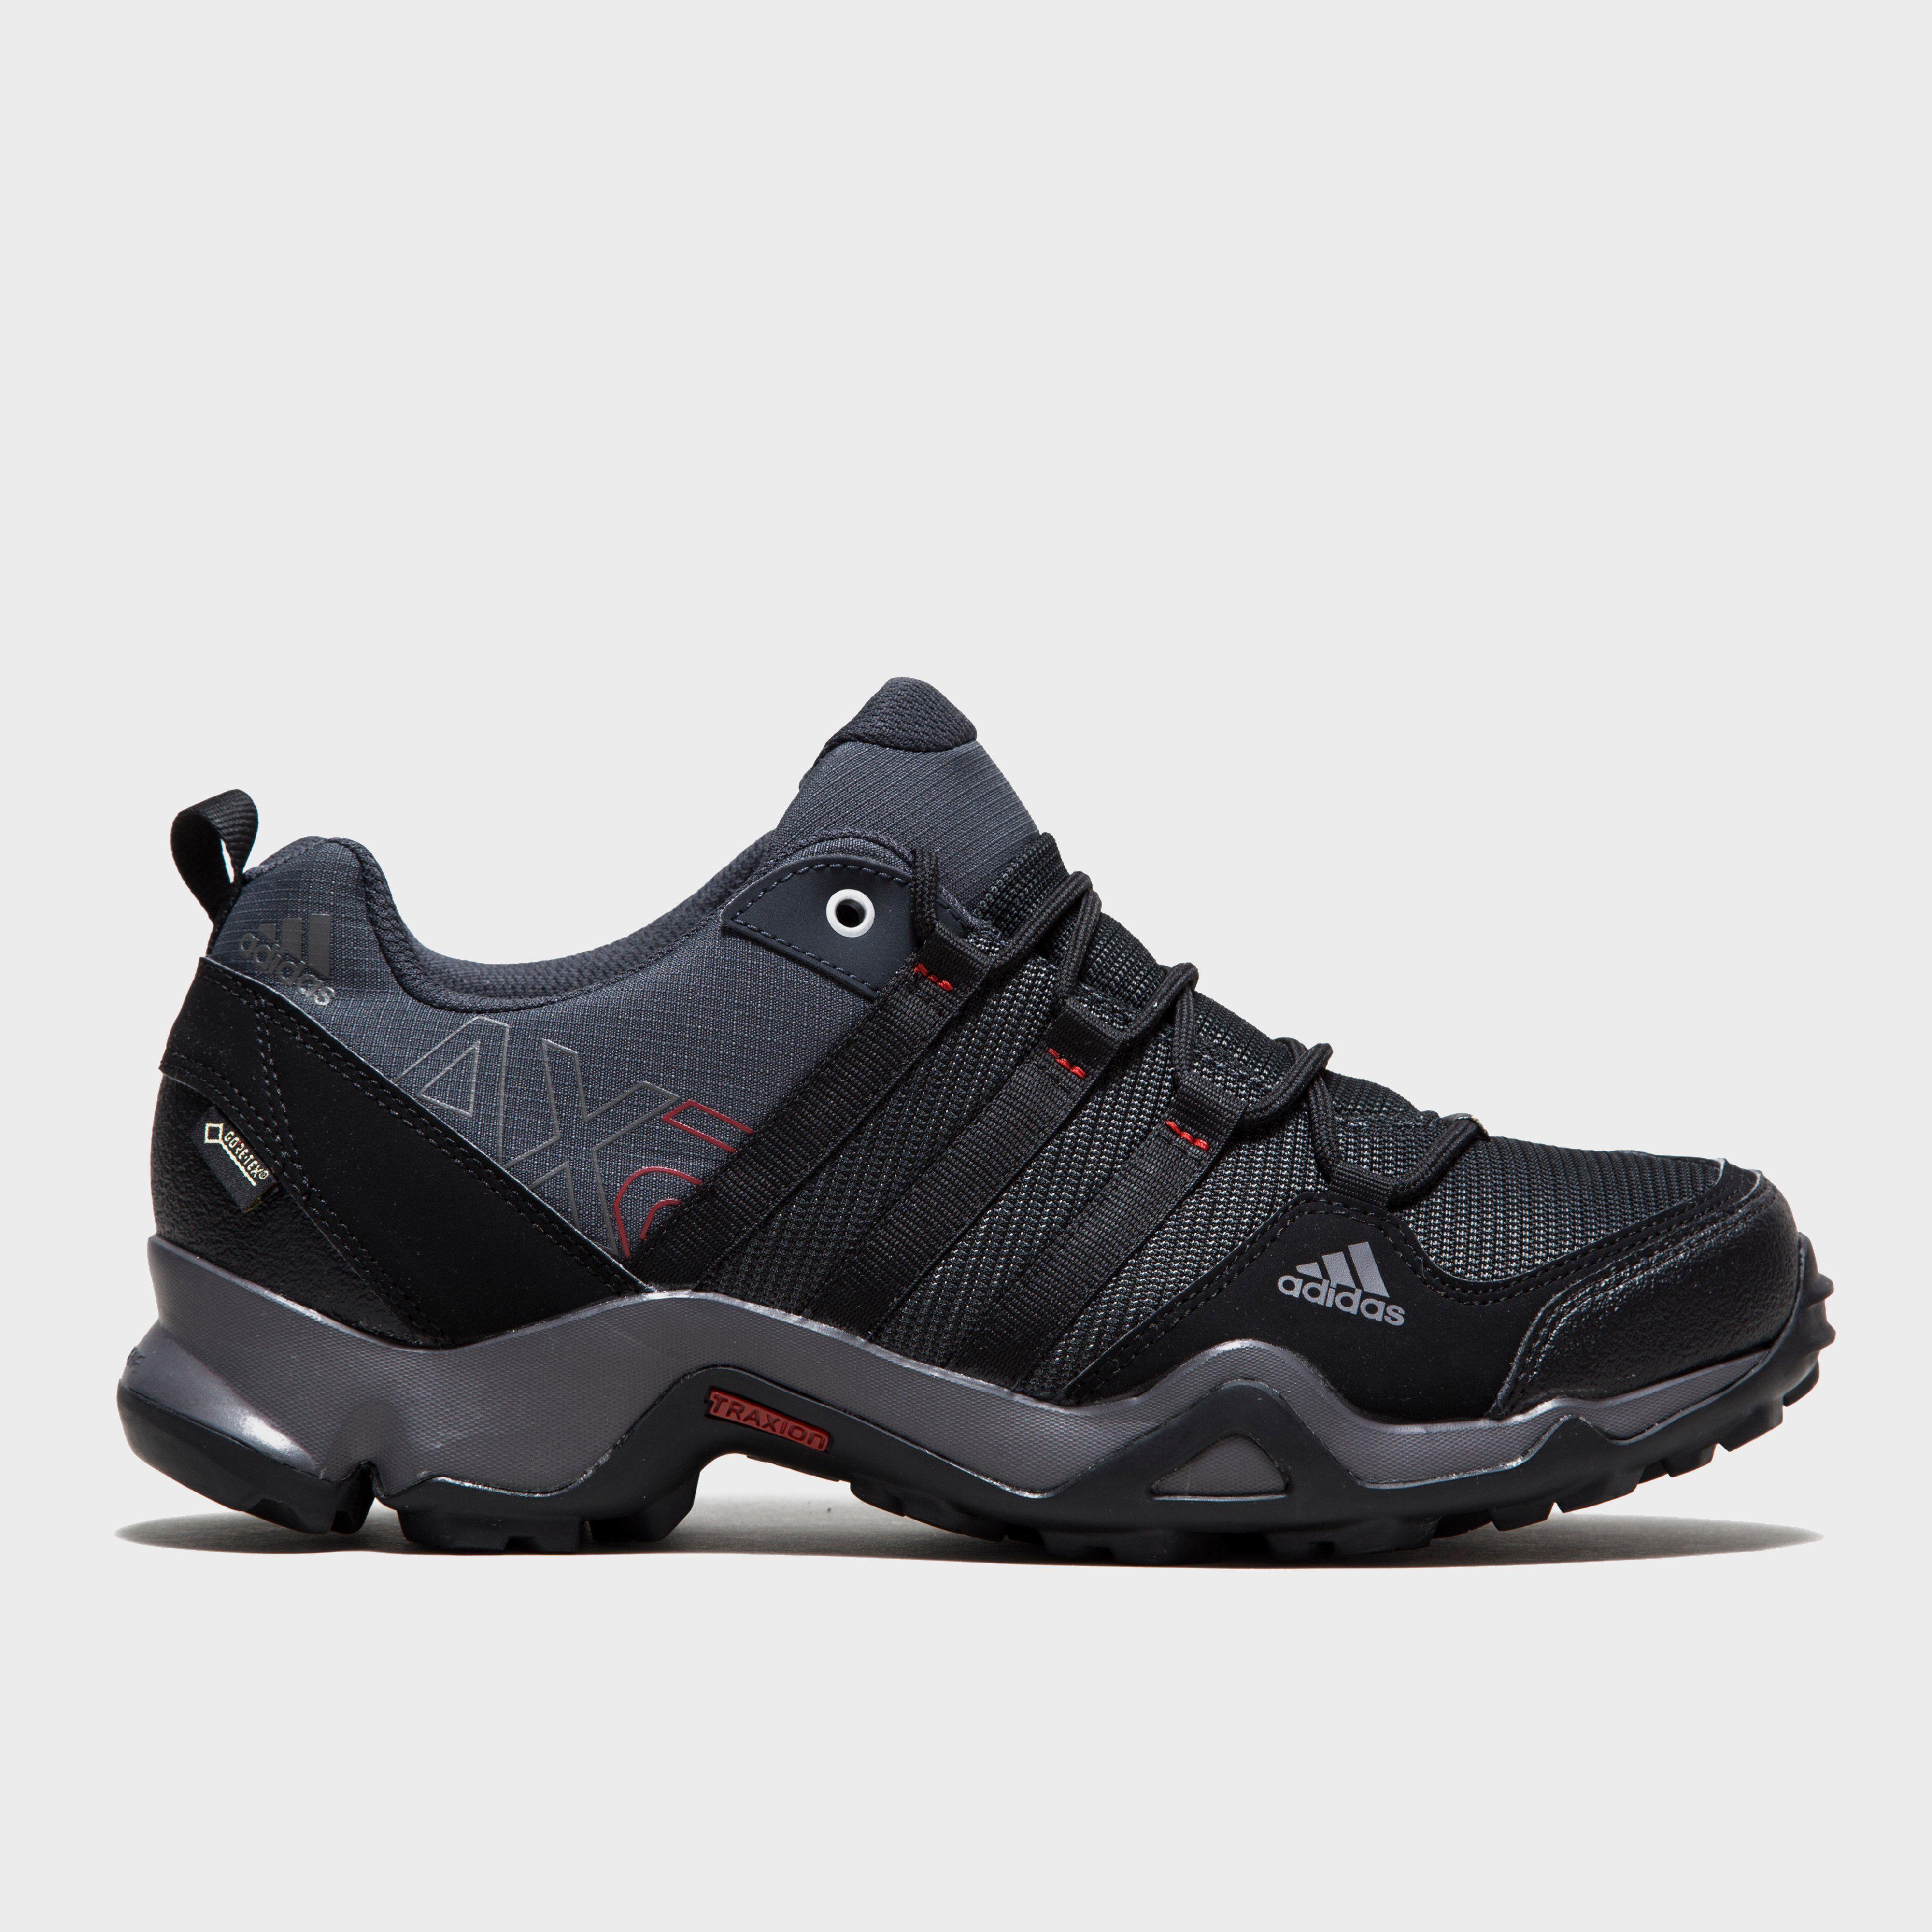 ADIDAS Men's AX2 GORE-TEX® Shoe